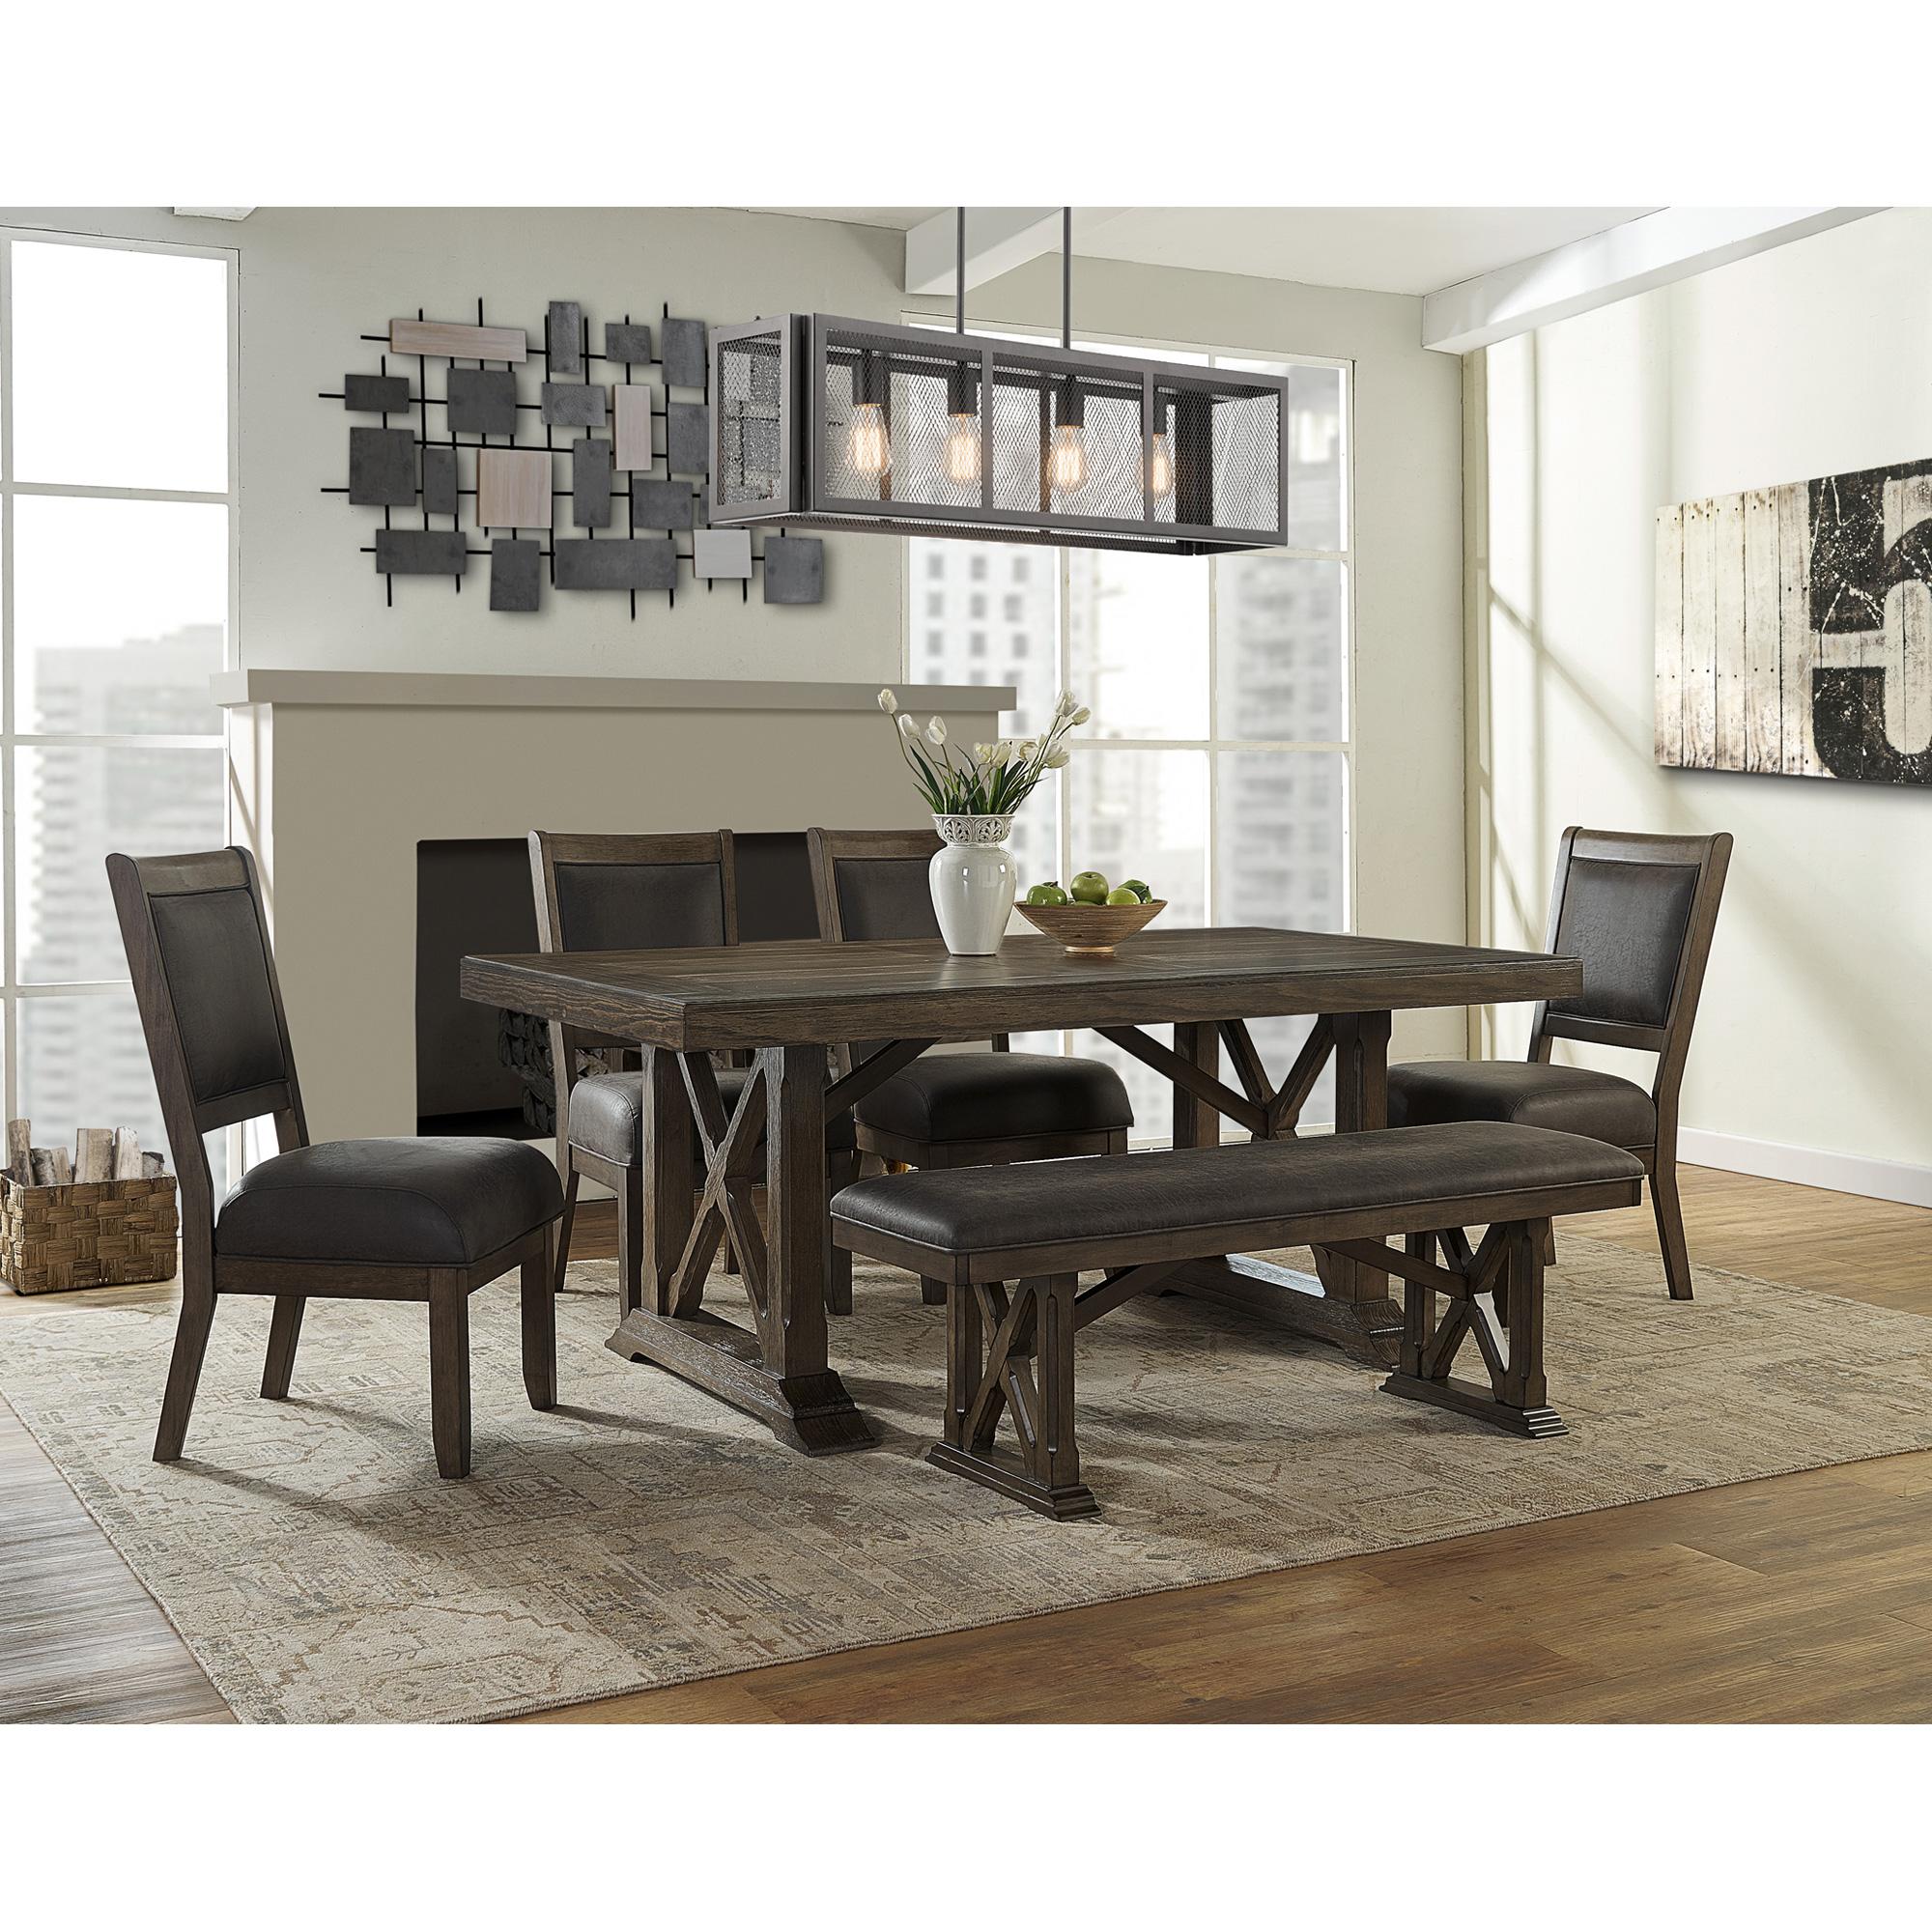 Whalen Furniture | Lawton Rustic Brown 5 Piece Dining Set